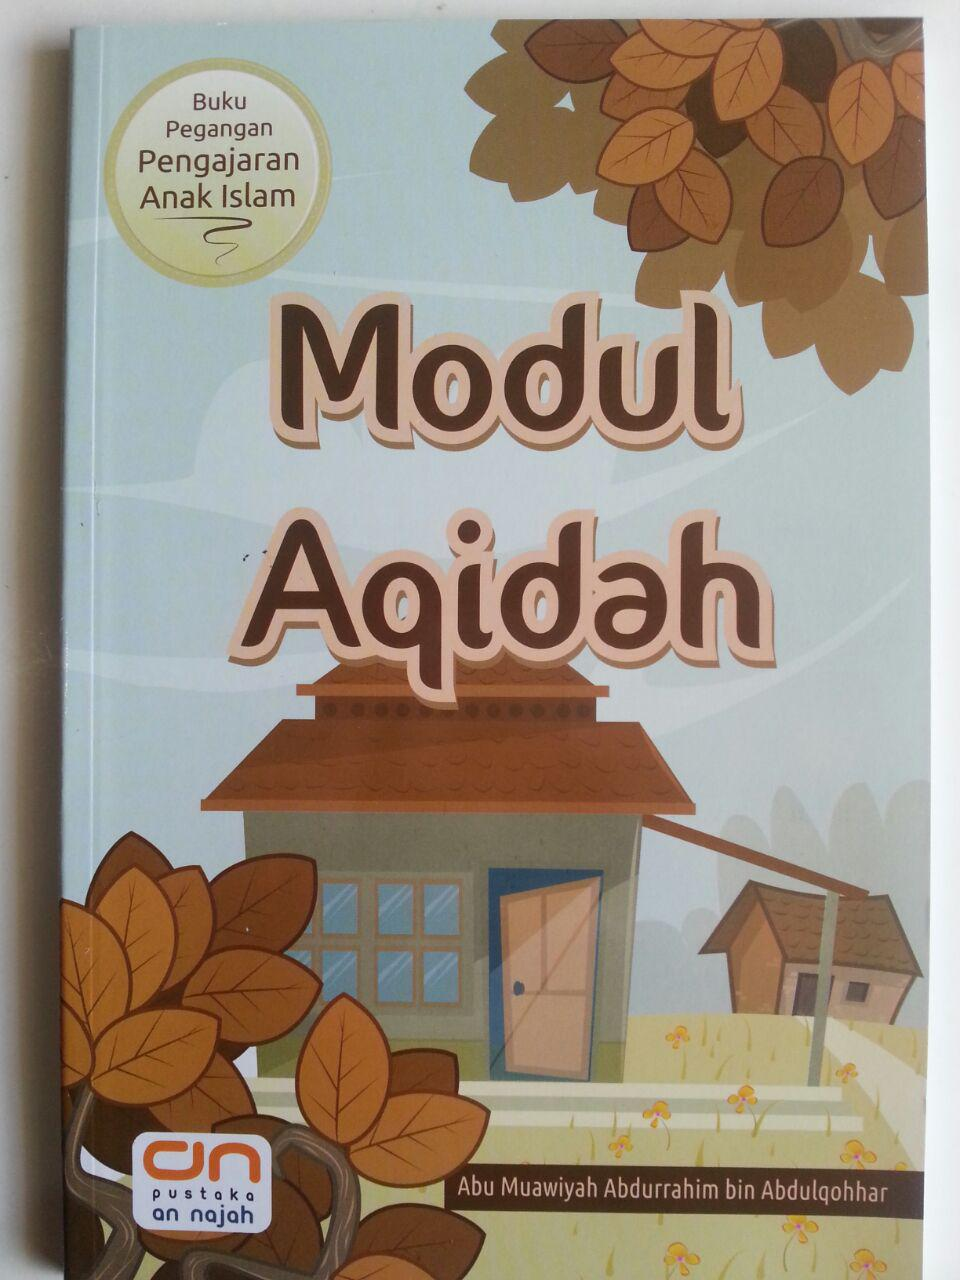 Buku Modul Aqidah Buku Pegangan Pengajaran Anak Islam cover 2